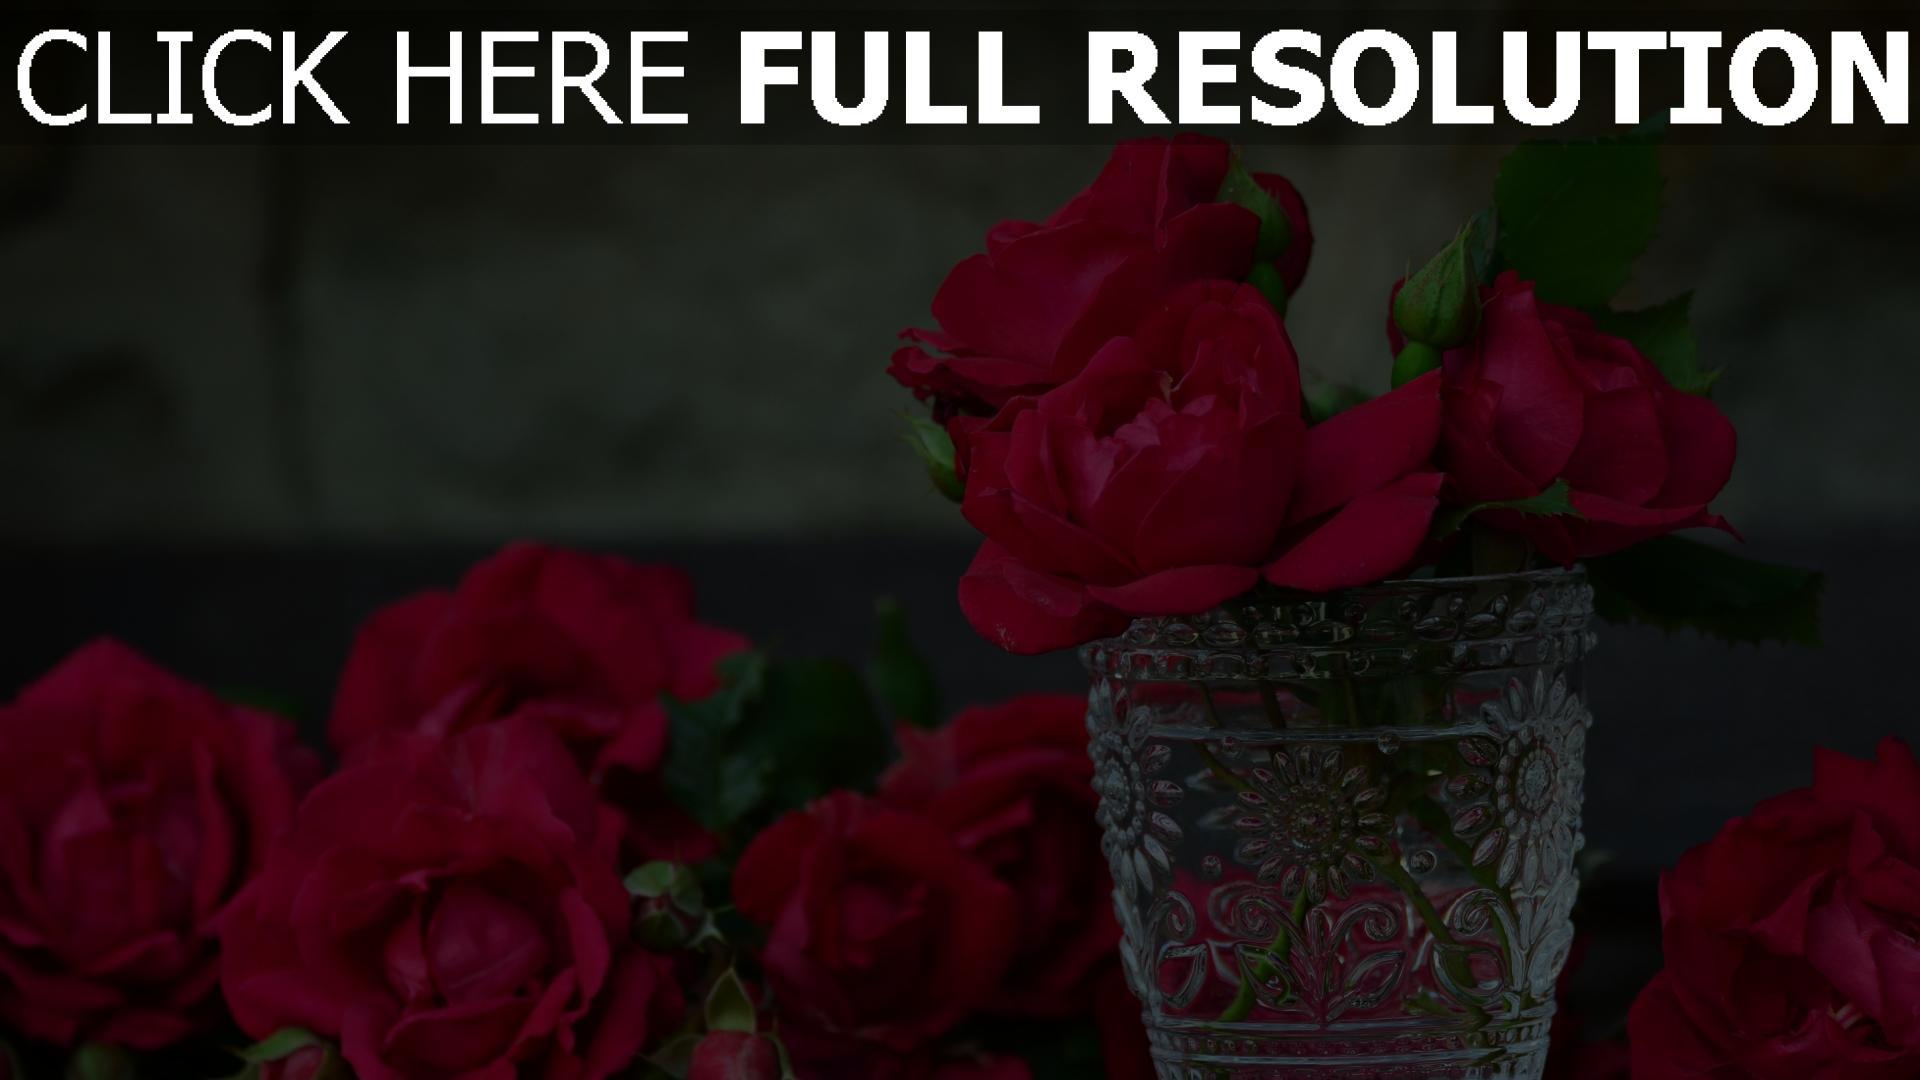 hd hintergrundbilder rote rosen bl tenbl tter vase glas knospen bl ten desktop hintergrund. Black Bedroom Furniture Sets. Home Design Ideas